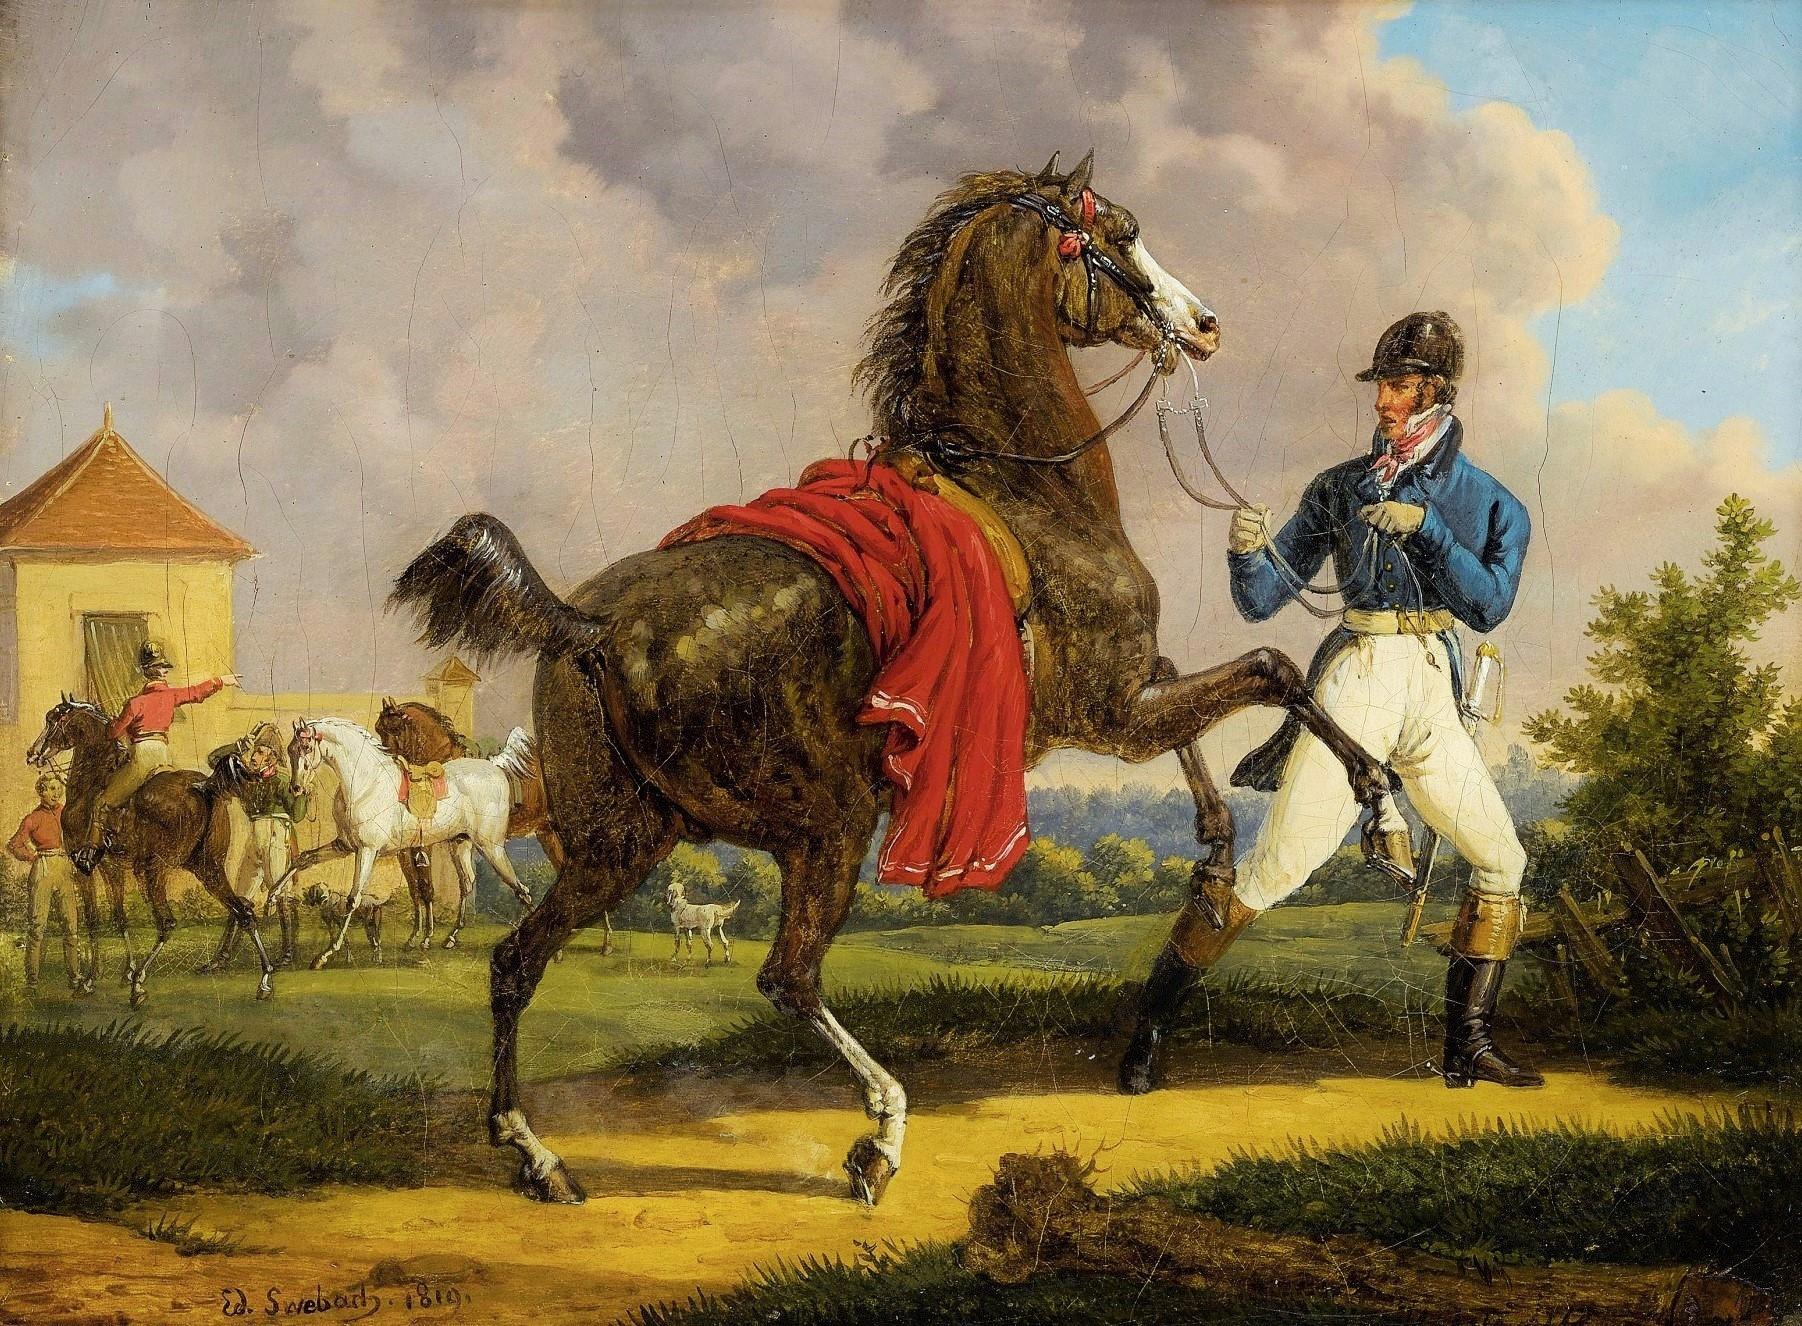 Bernard-Edouard Swebach Cheval Louis XVIII écuries royales Versailles (3)